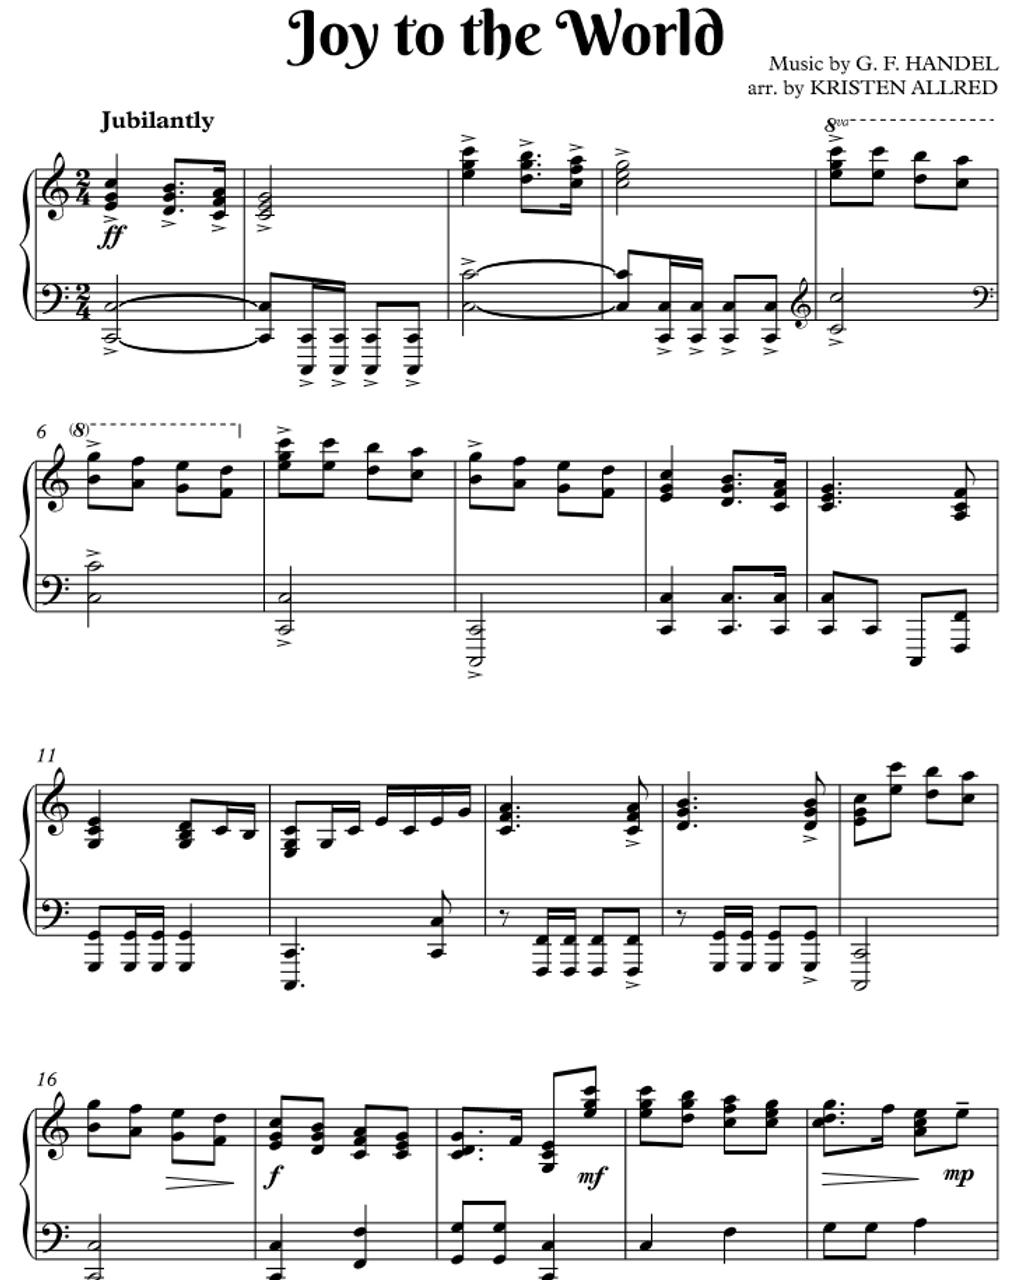 Joy To The World - Piano Solo Sheet Music PDF Download